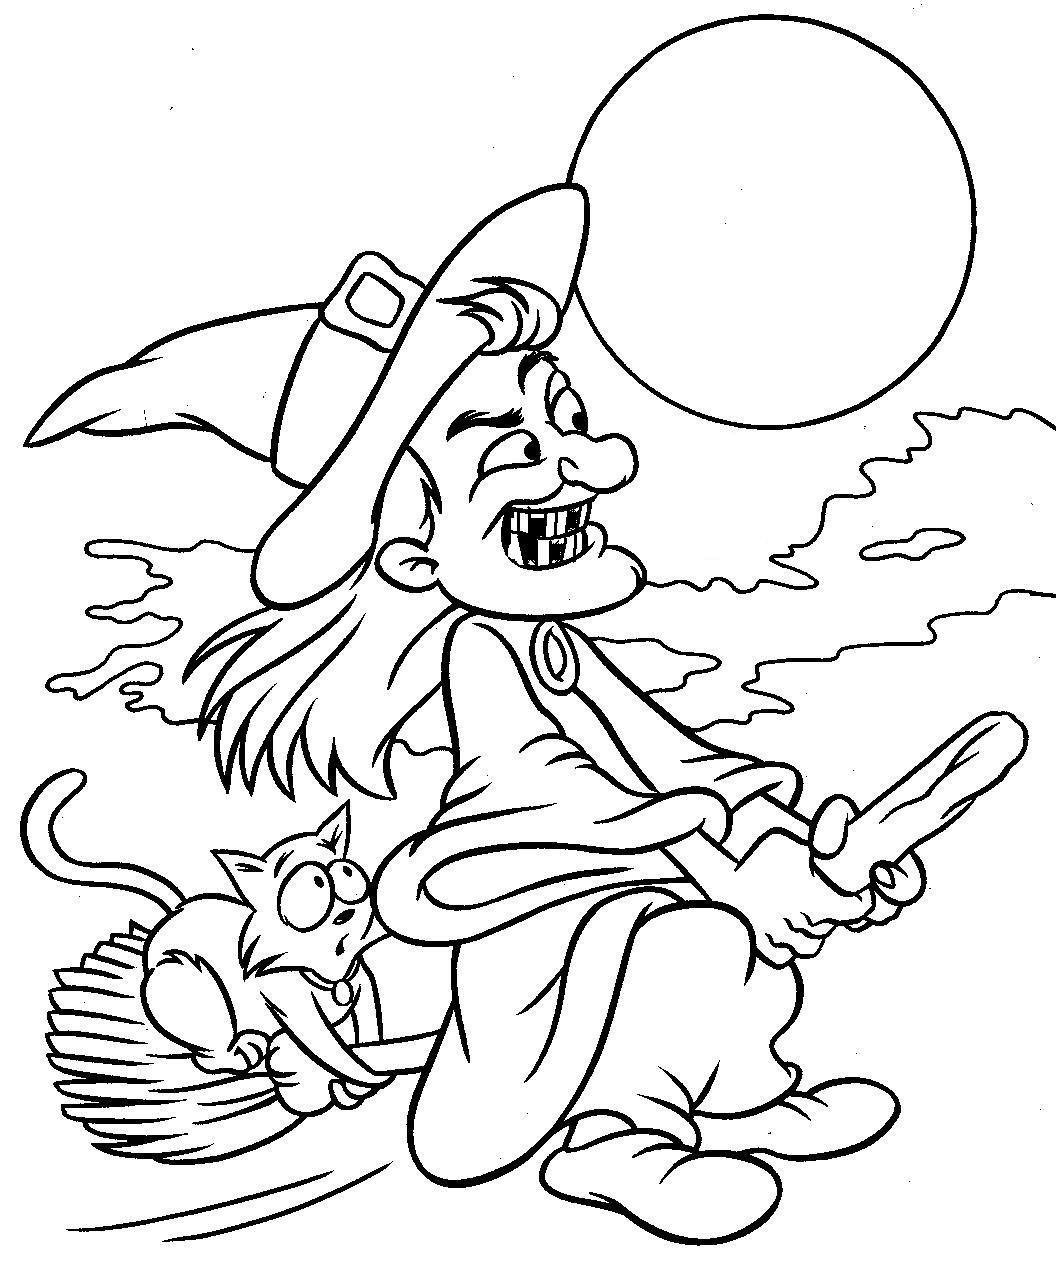 Dibujos para colorear de Halloween